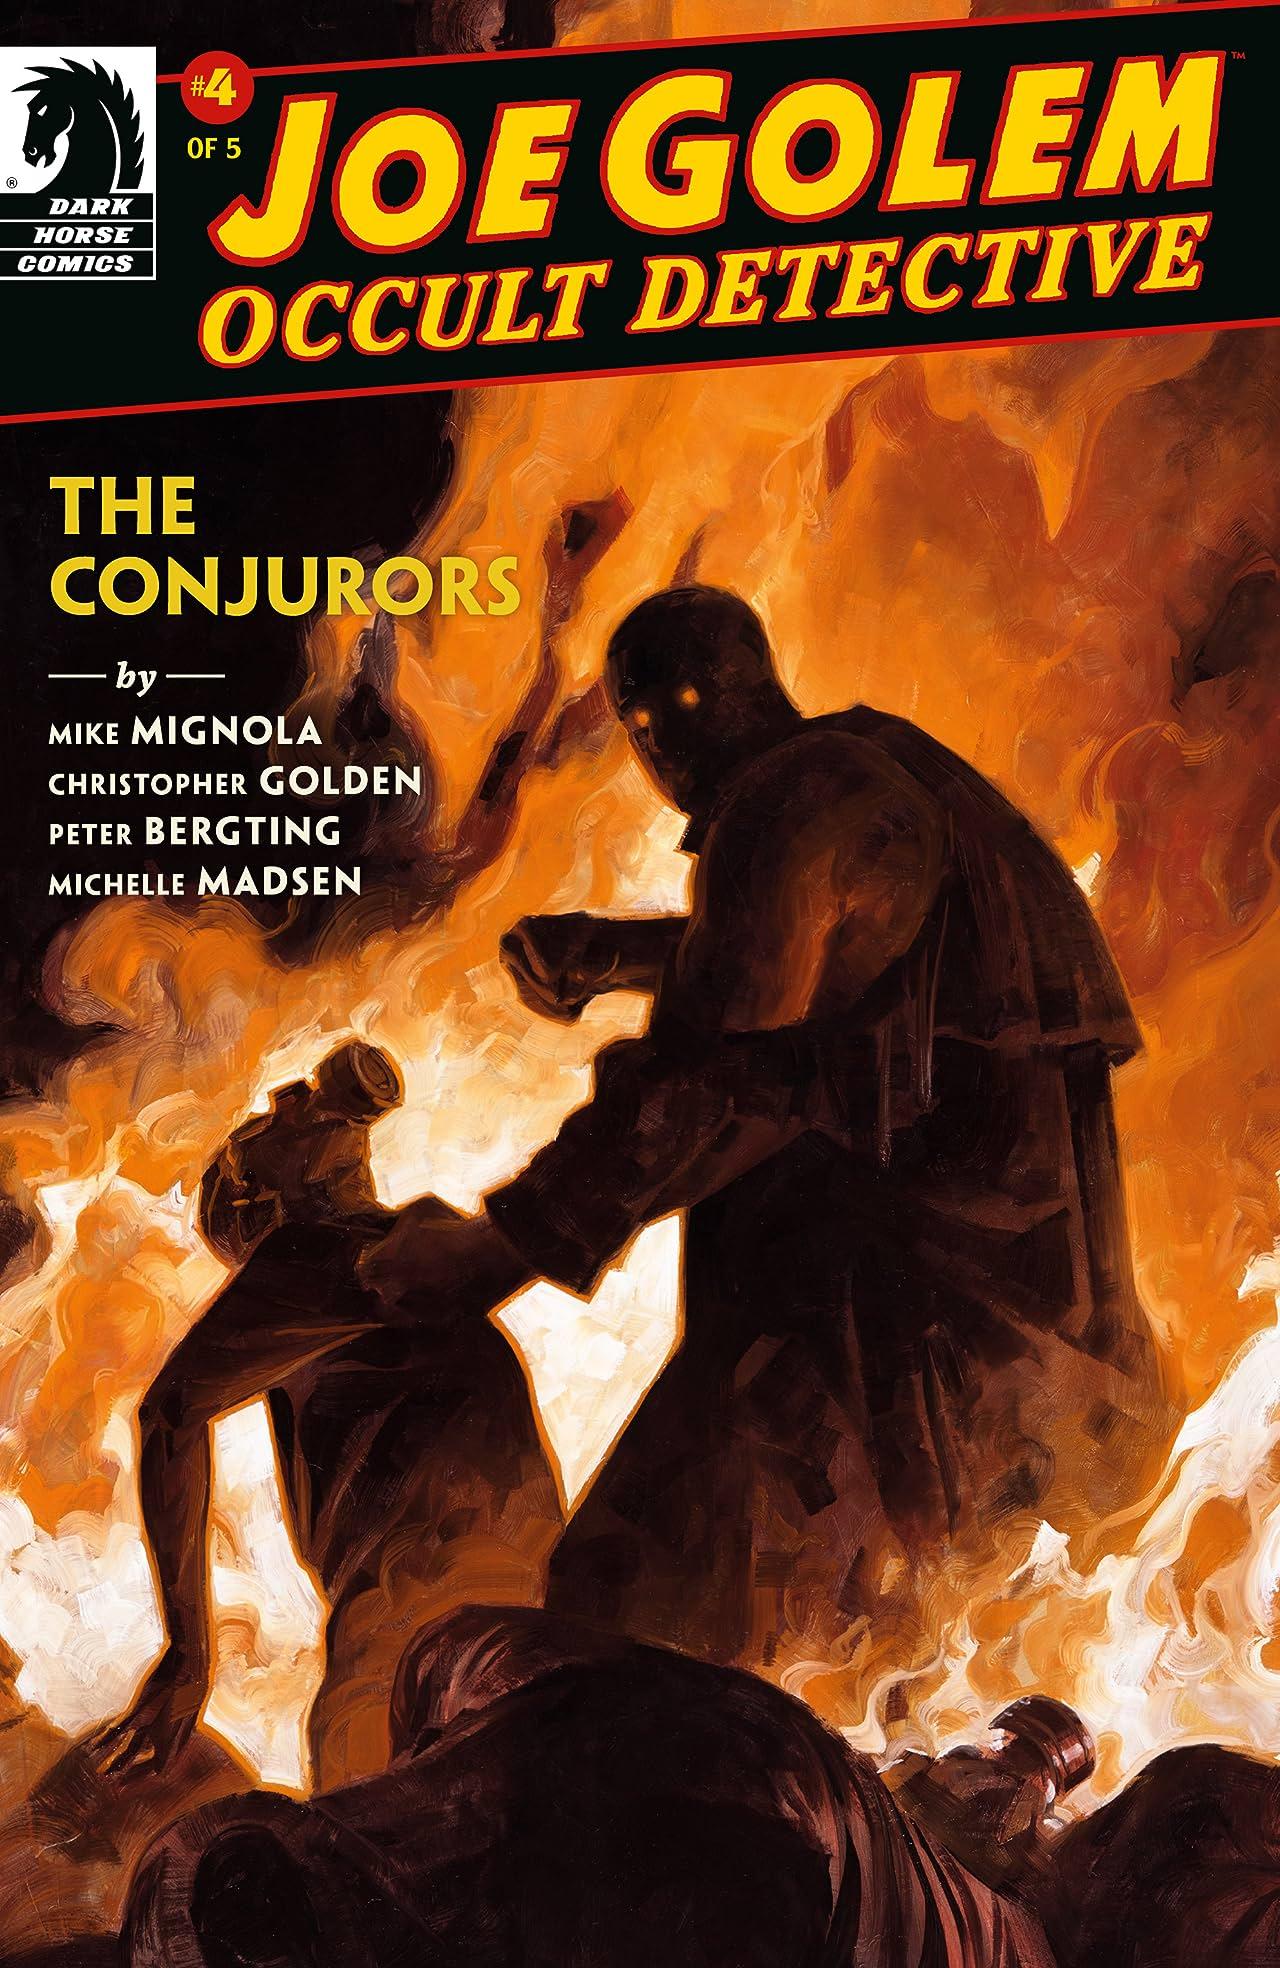 Joe Golem: Occult Detective--The Conjurors #4